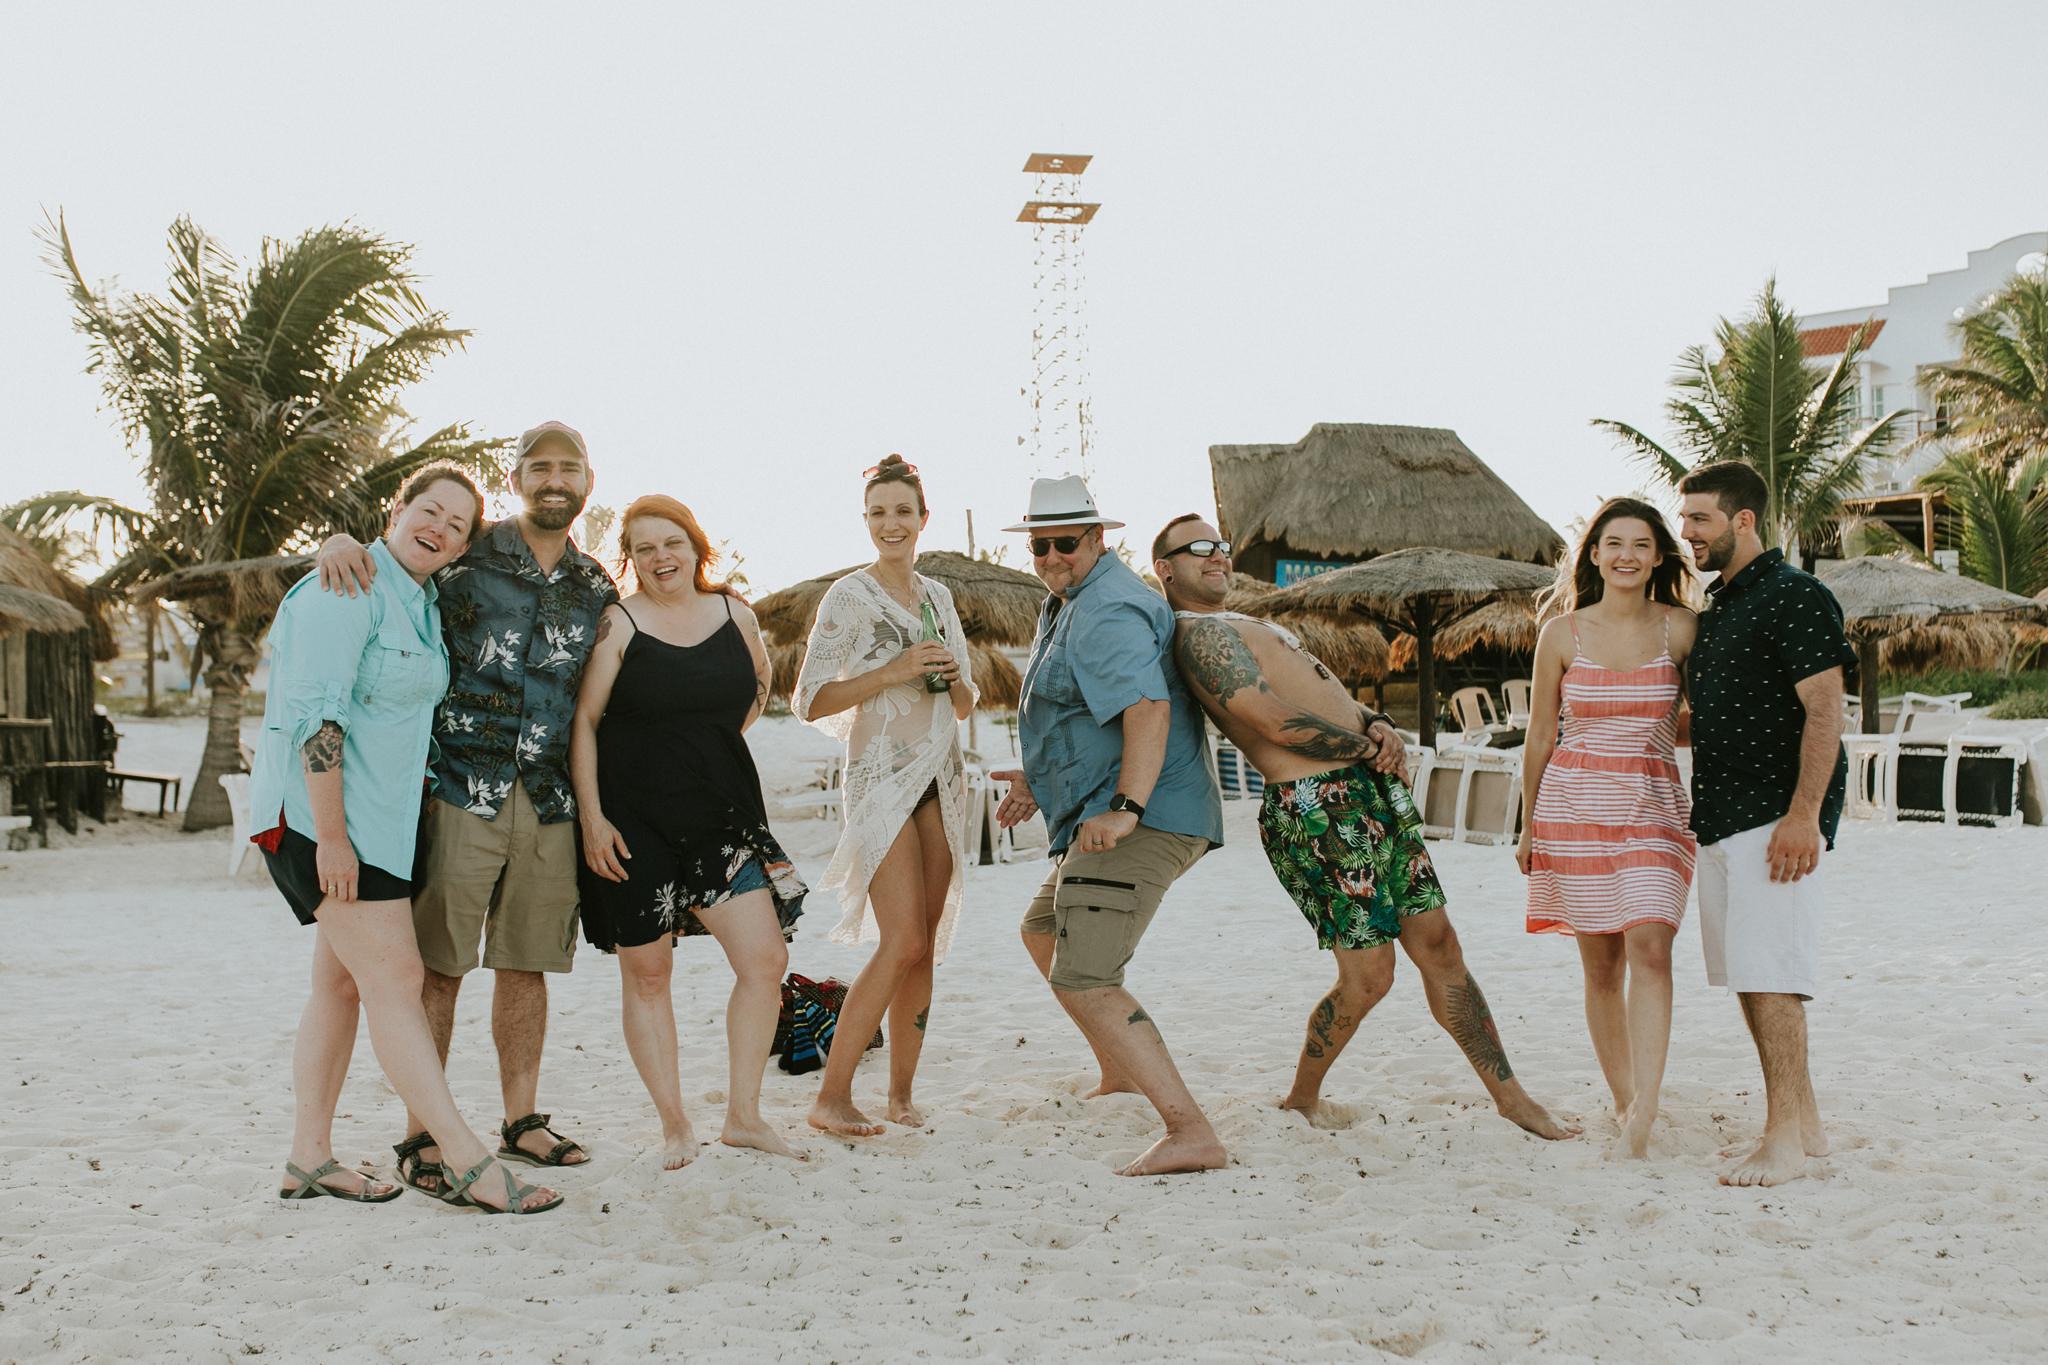 cancun-07-13-2019-family-trip-25_original.jpg